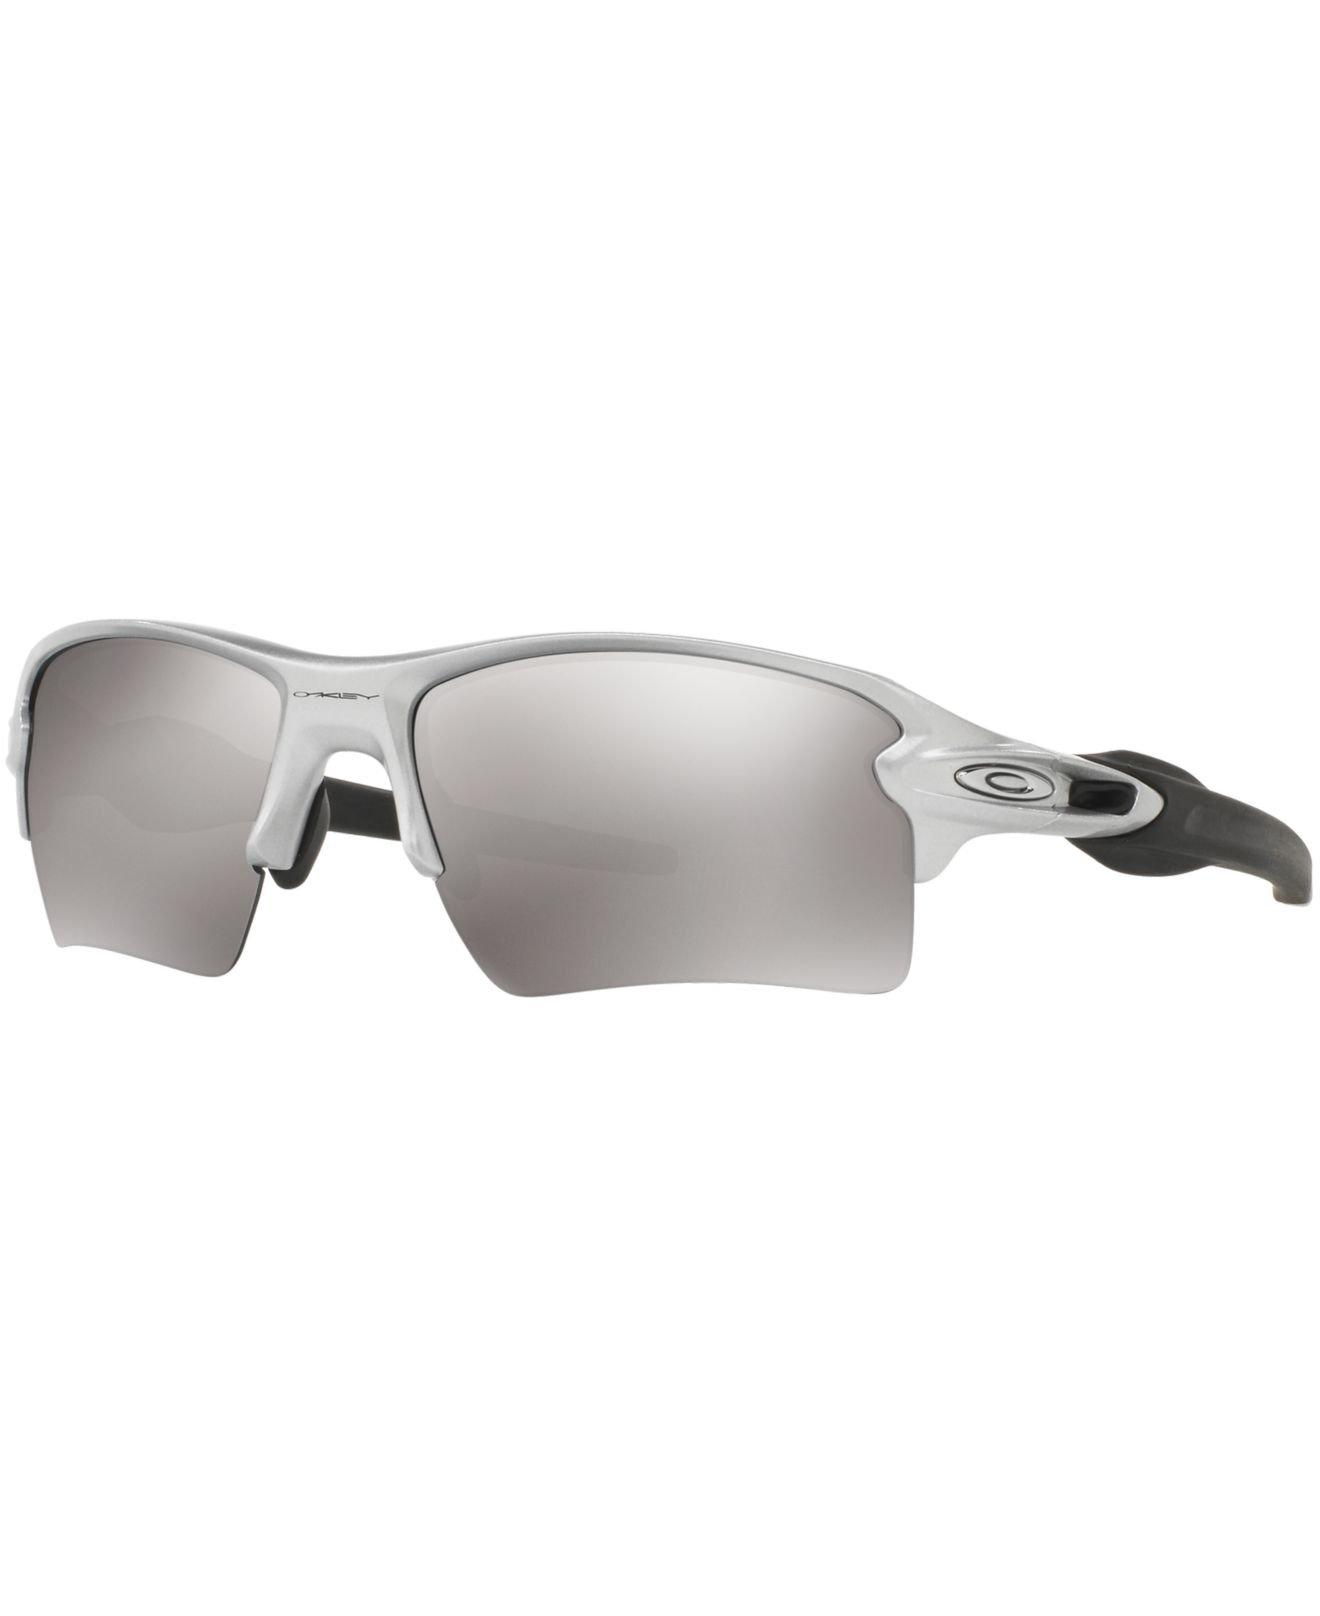 5c16fb01ef Lyst - Oakley Oo9188 Flak 2.0 Xl in Metallic for Men